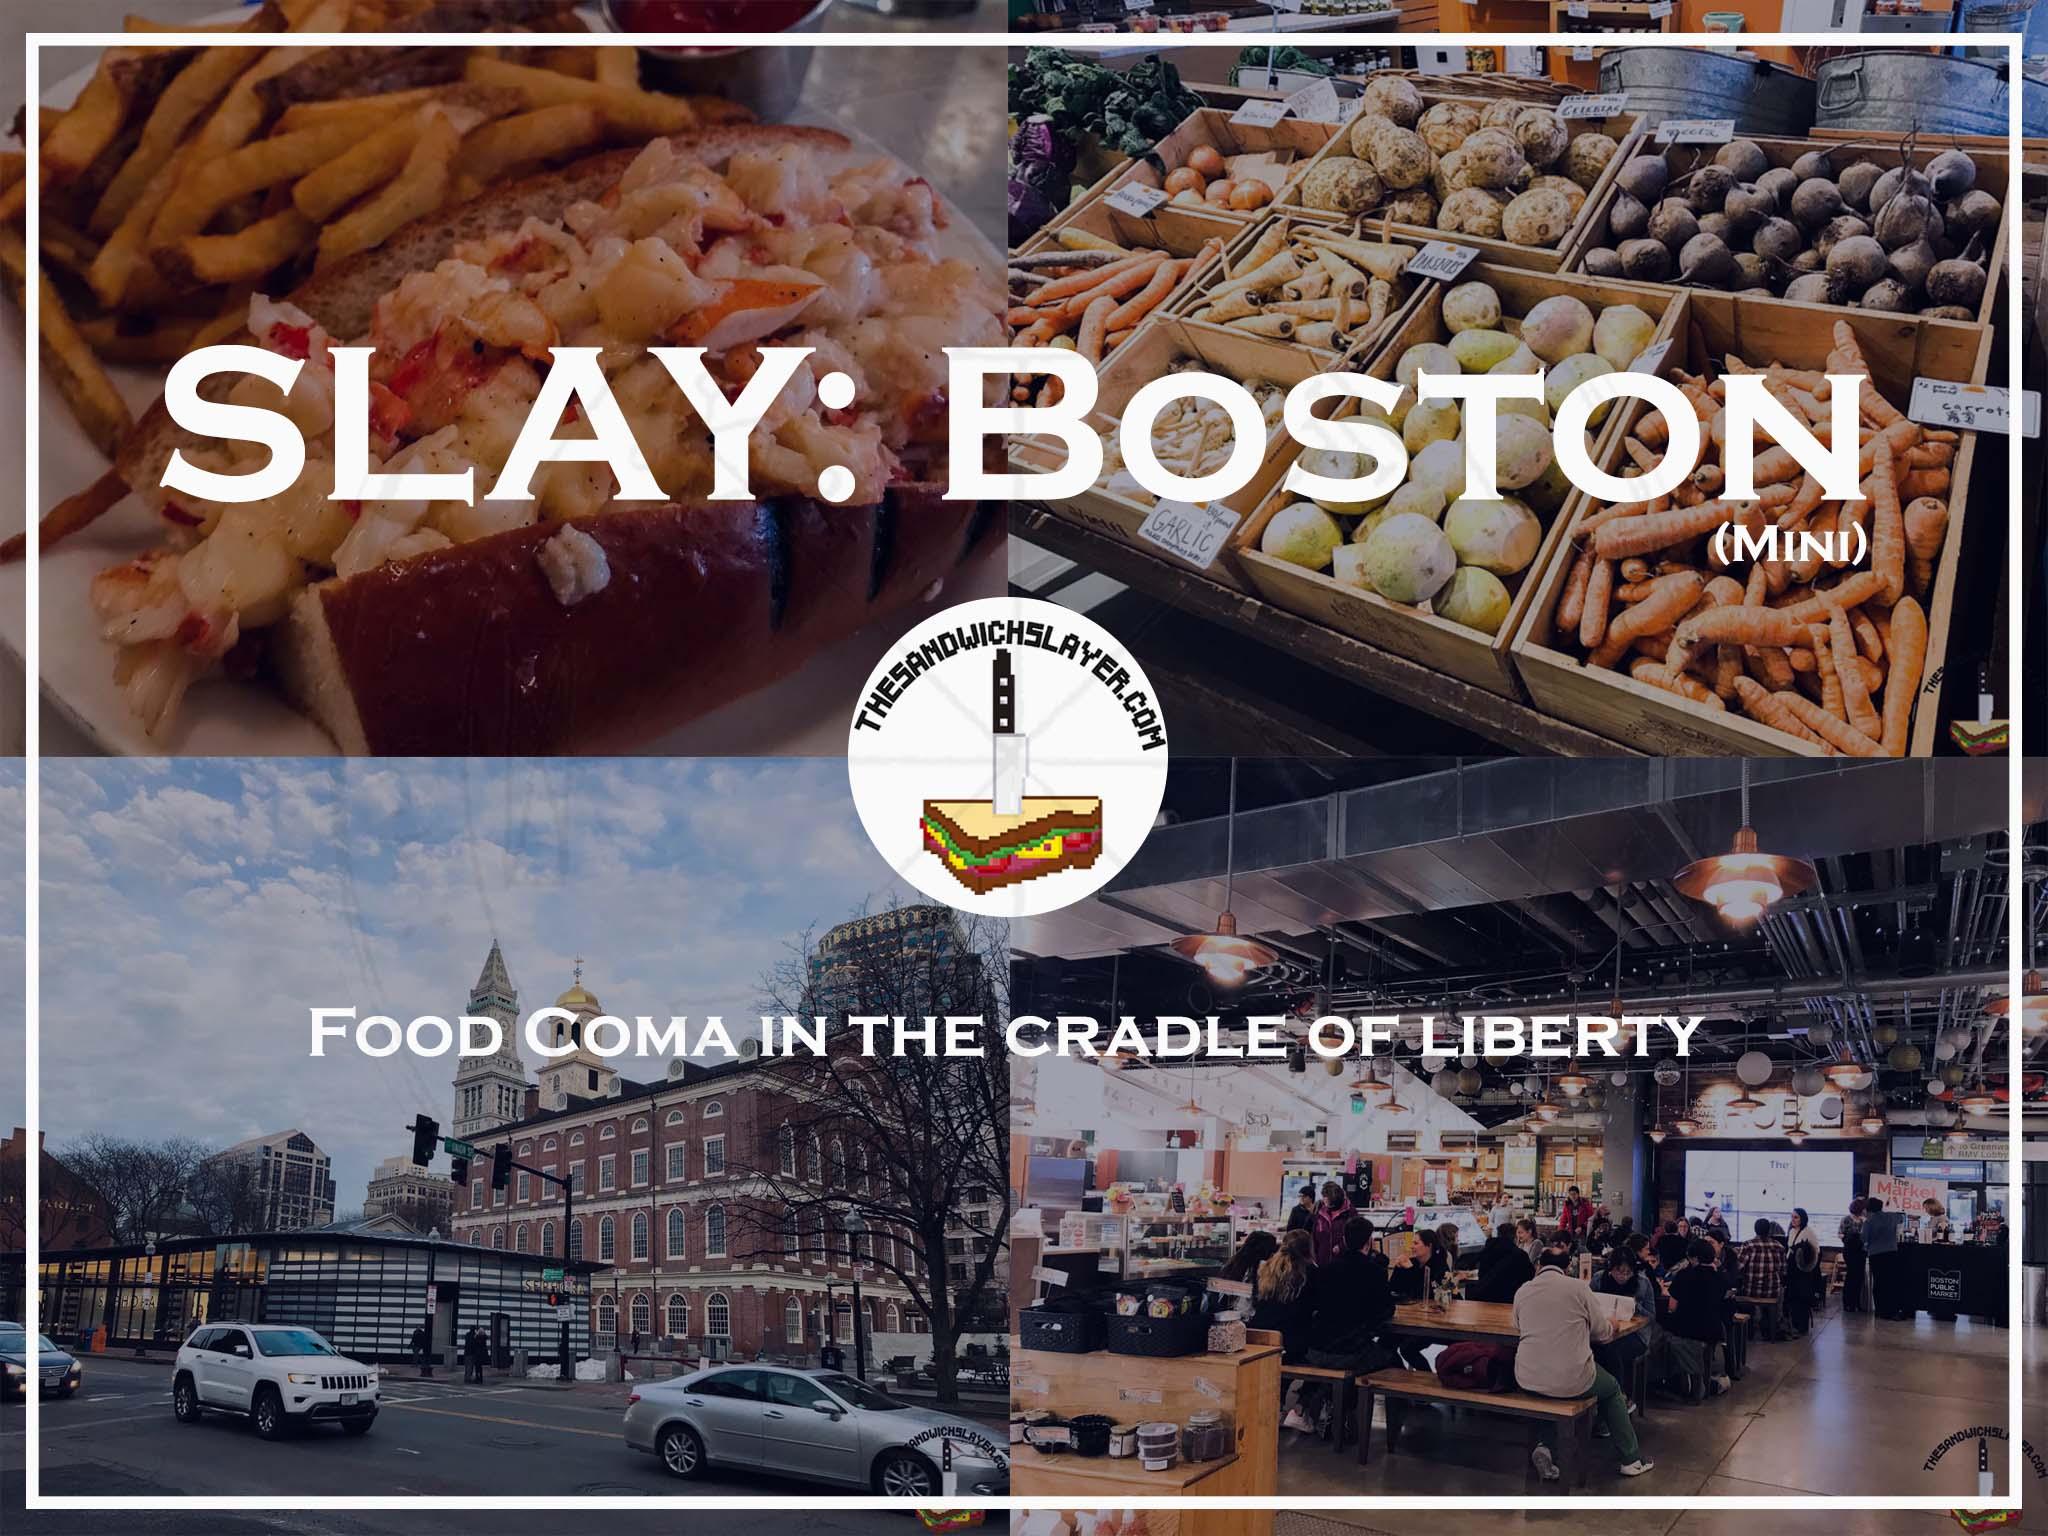 Slay: Boston